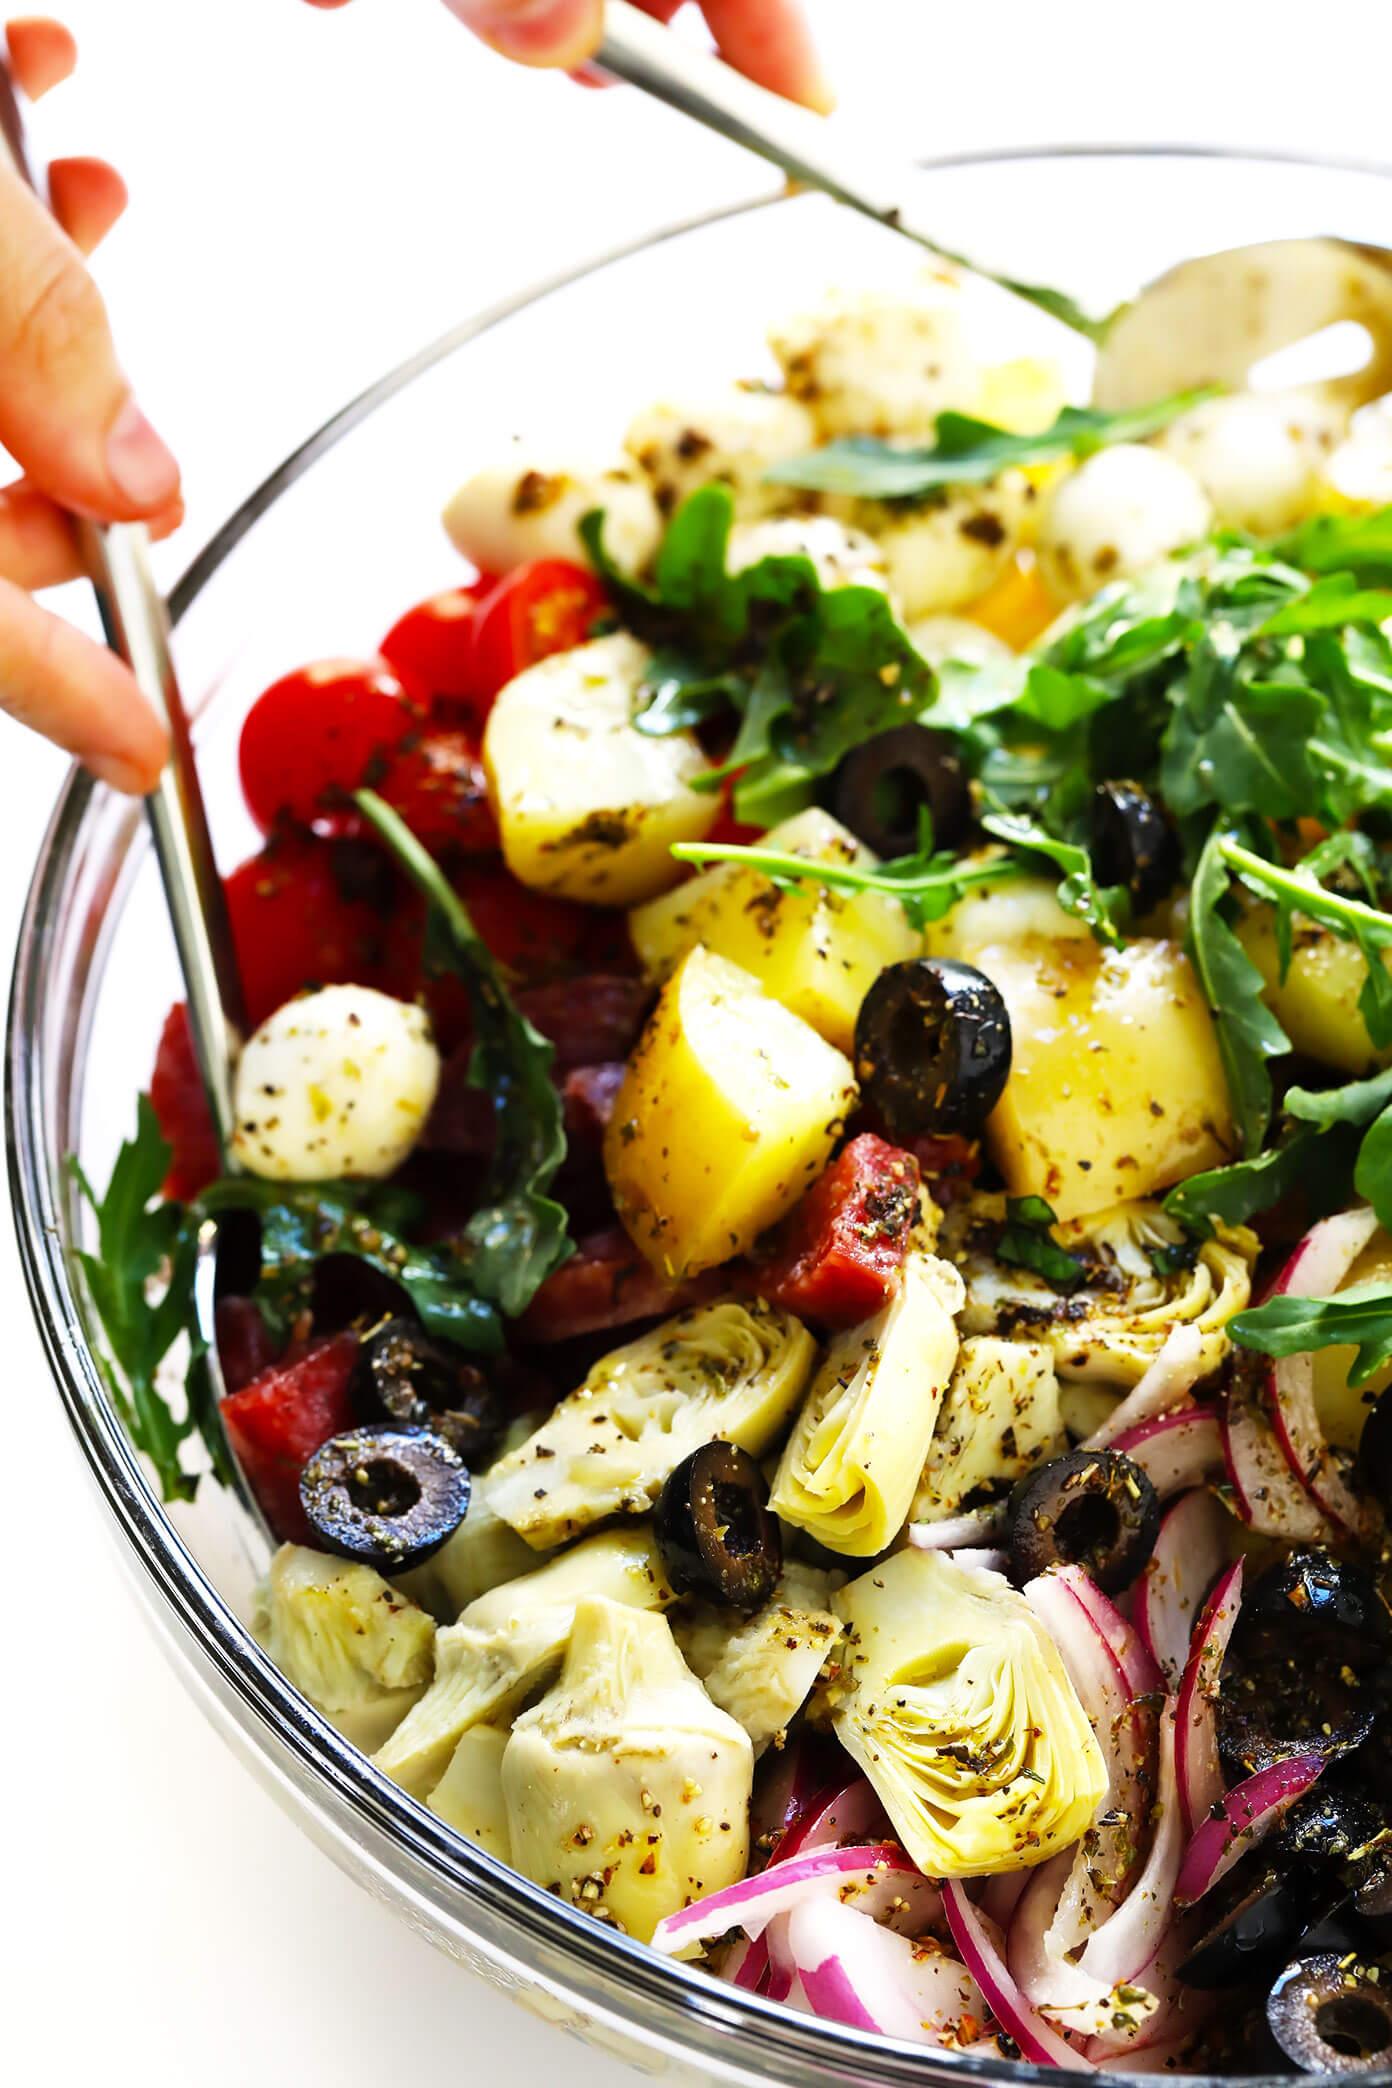 How To Make Italian Potato Salad